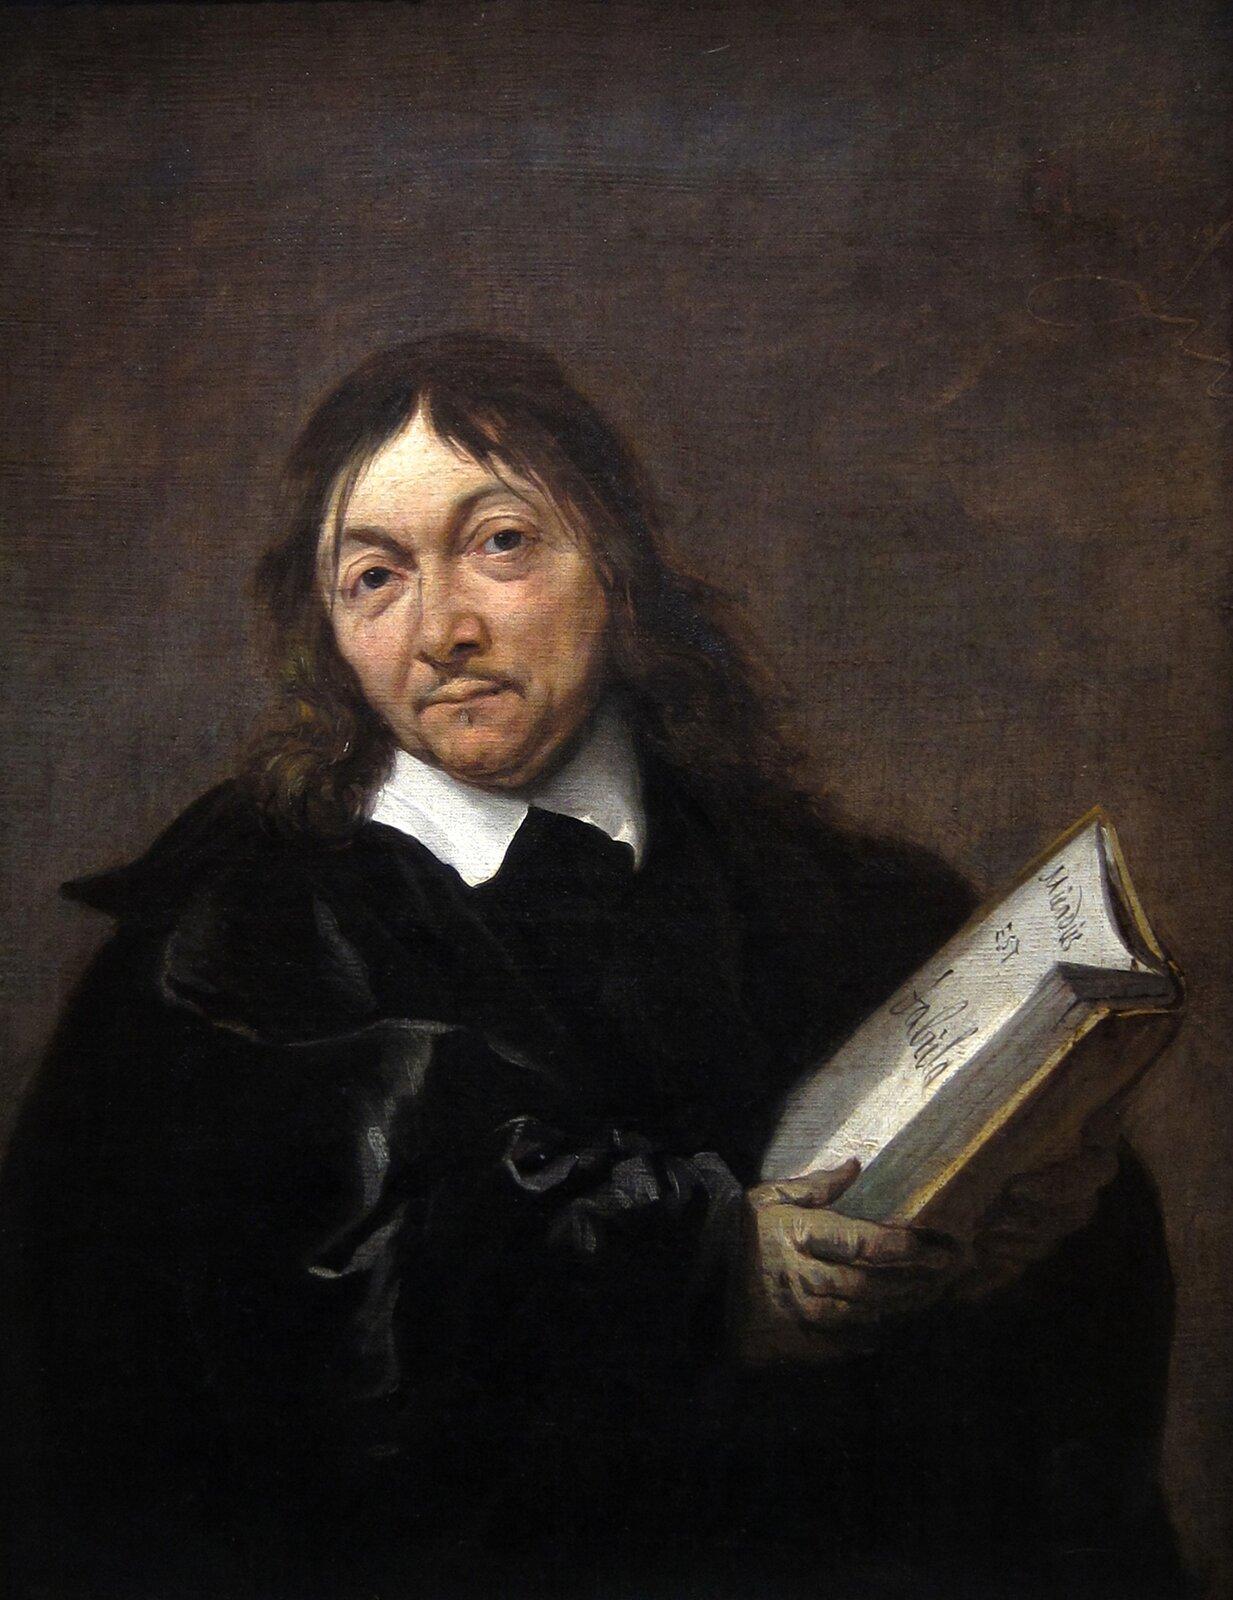 René Descartes (Kartezjusz) René Descartes (Kartezjusz) Źródło: Jan Baptist Weenix, 1647–1649, olej na płótnie, Centraal Museum, Utrecht, domena publiczna.